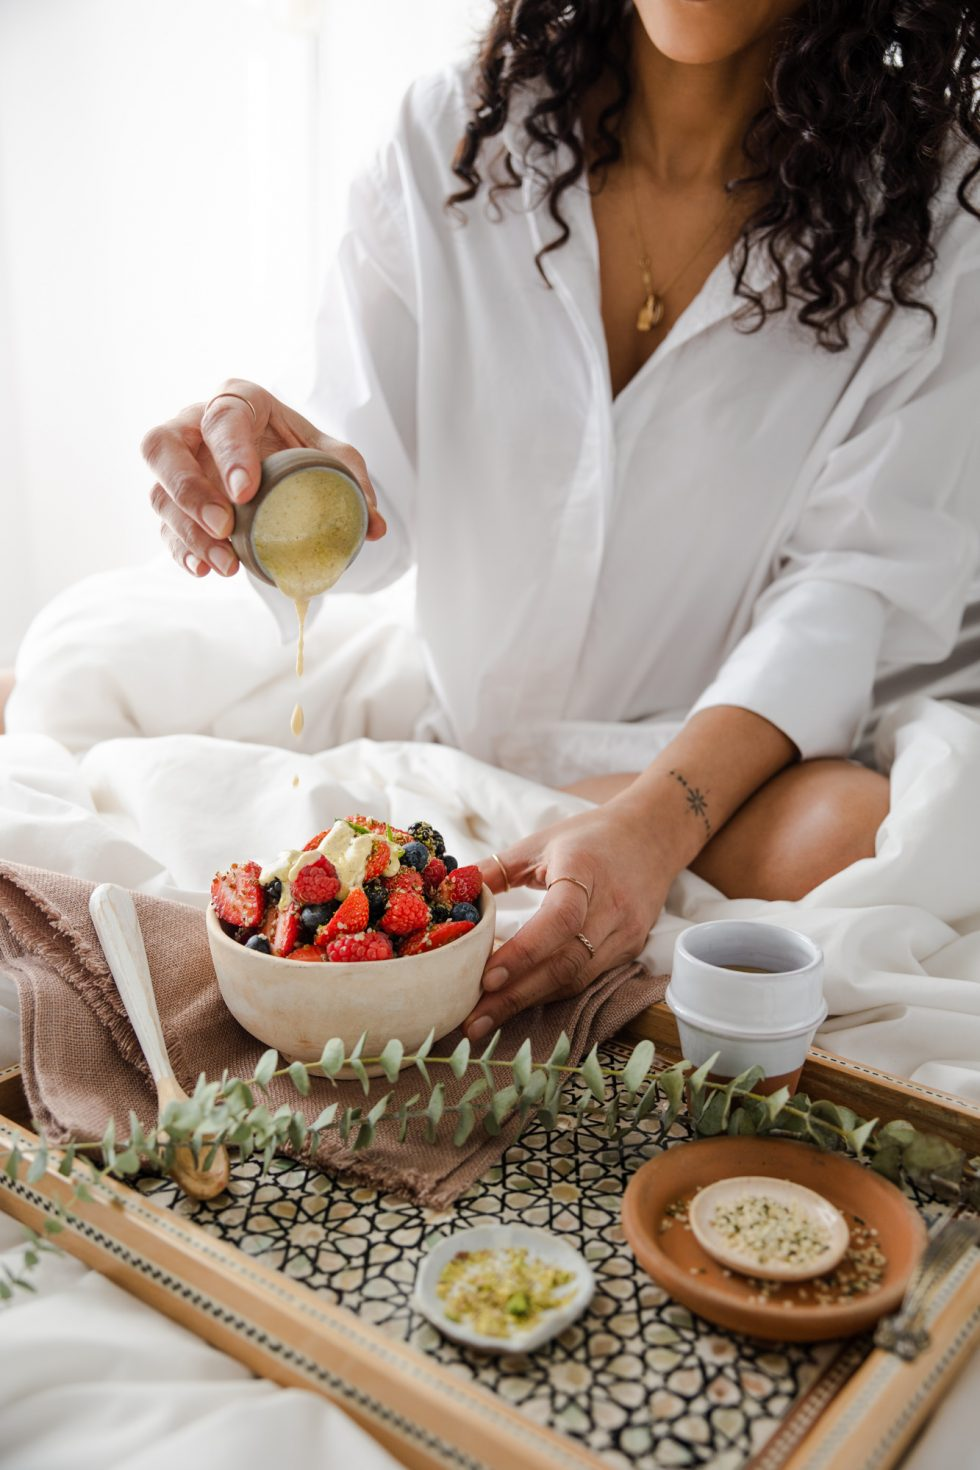 genevieve-plante-salad-book-food-lifestyle-photographer-laura-g-diaz